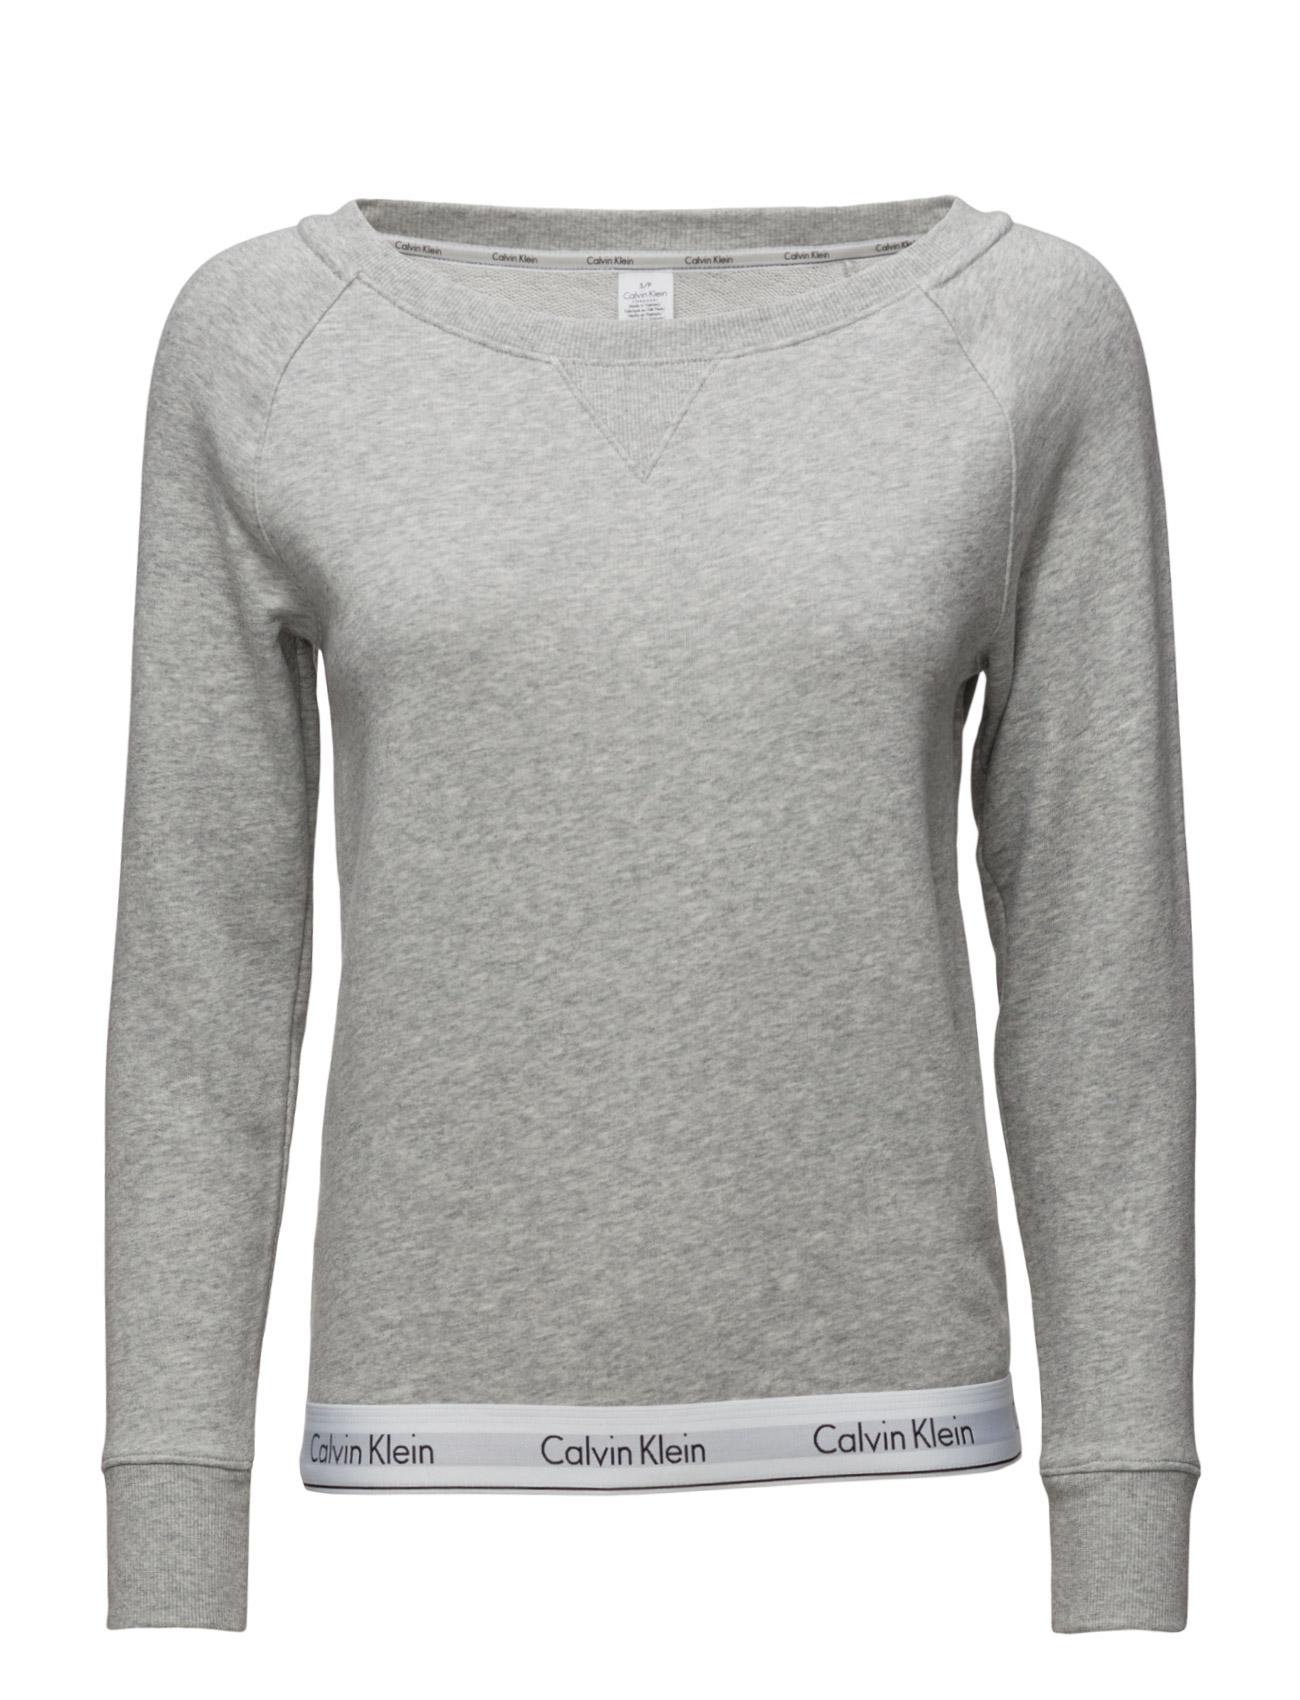 Top Sweatshirt Long Sleeve Calvin Klein  til Damer i Grå